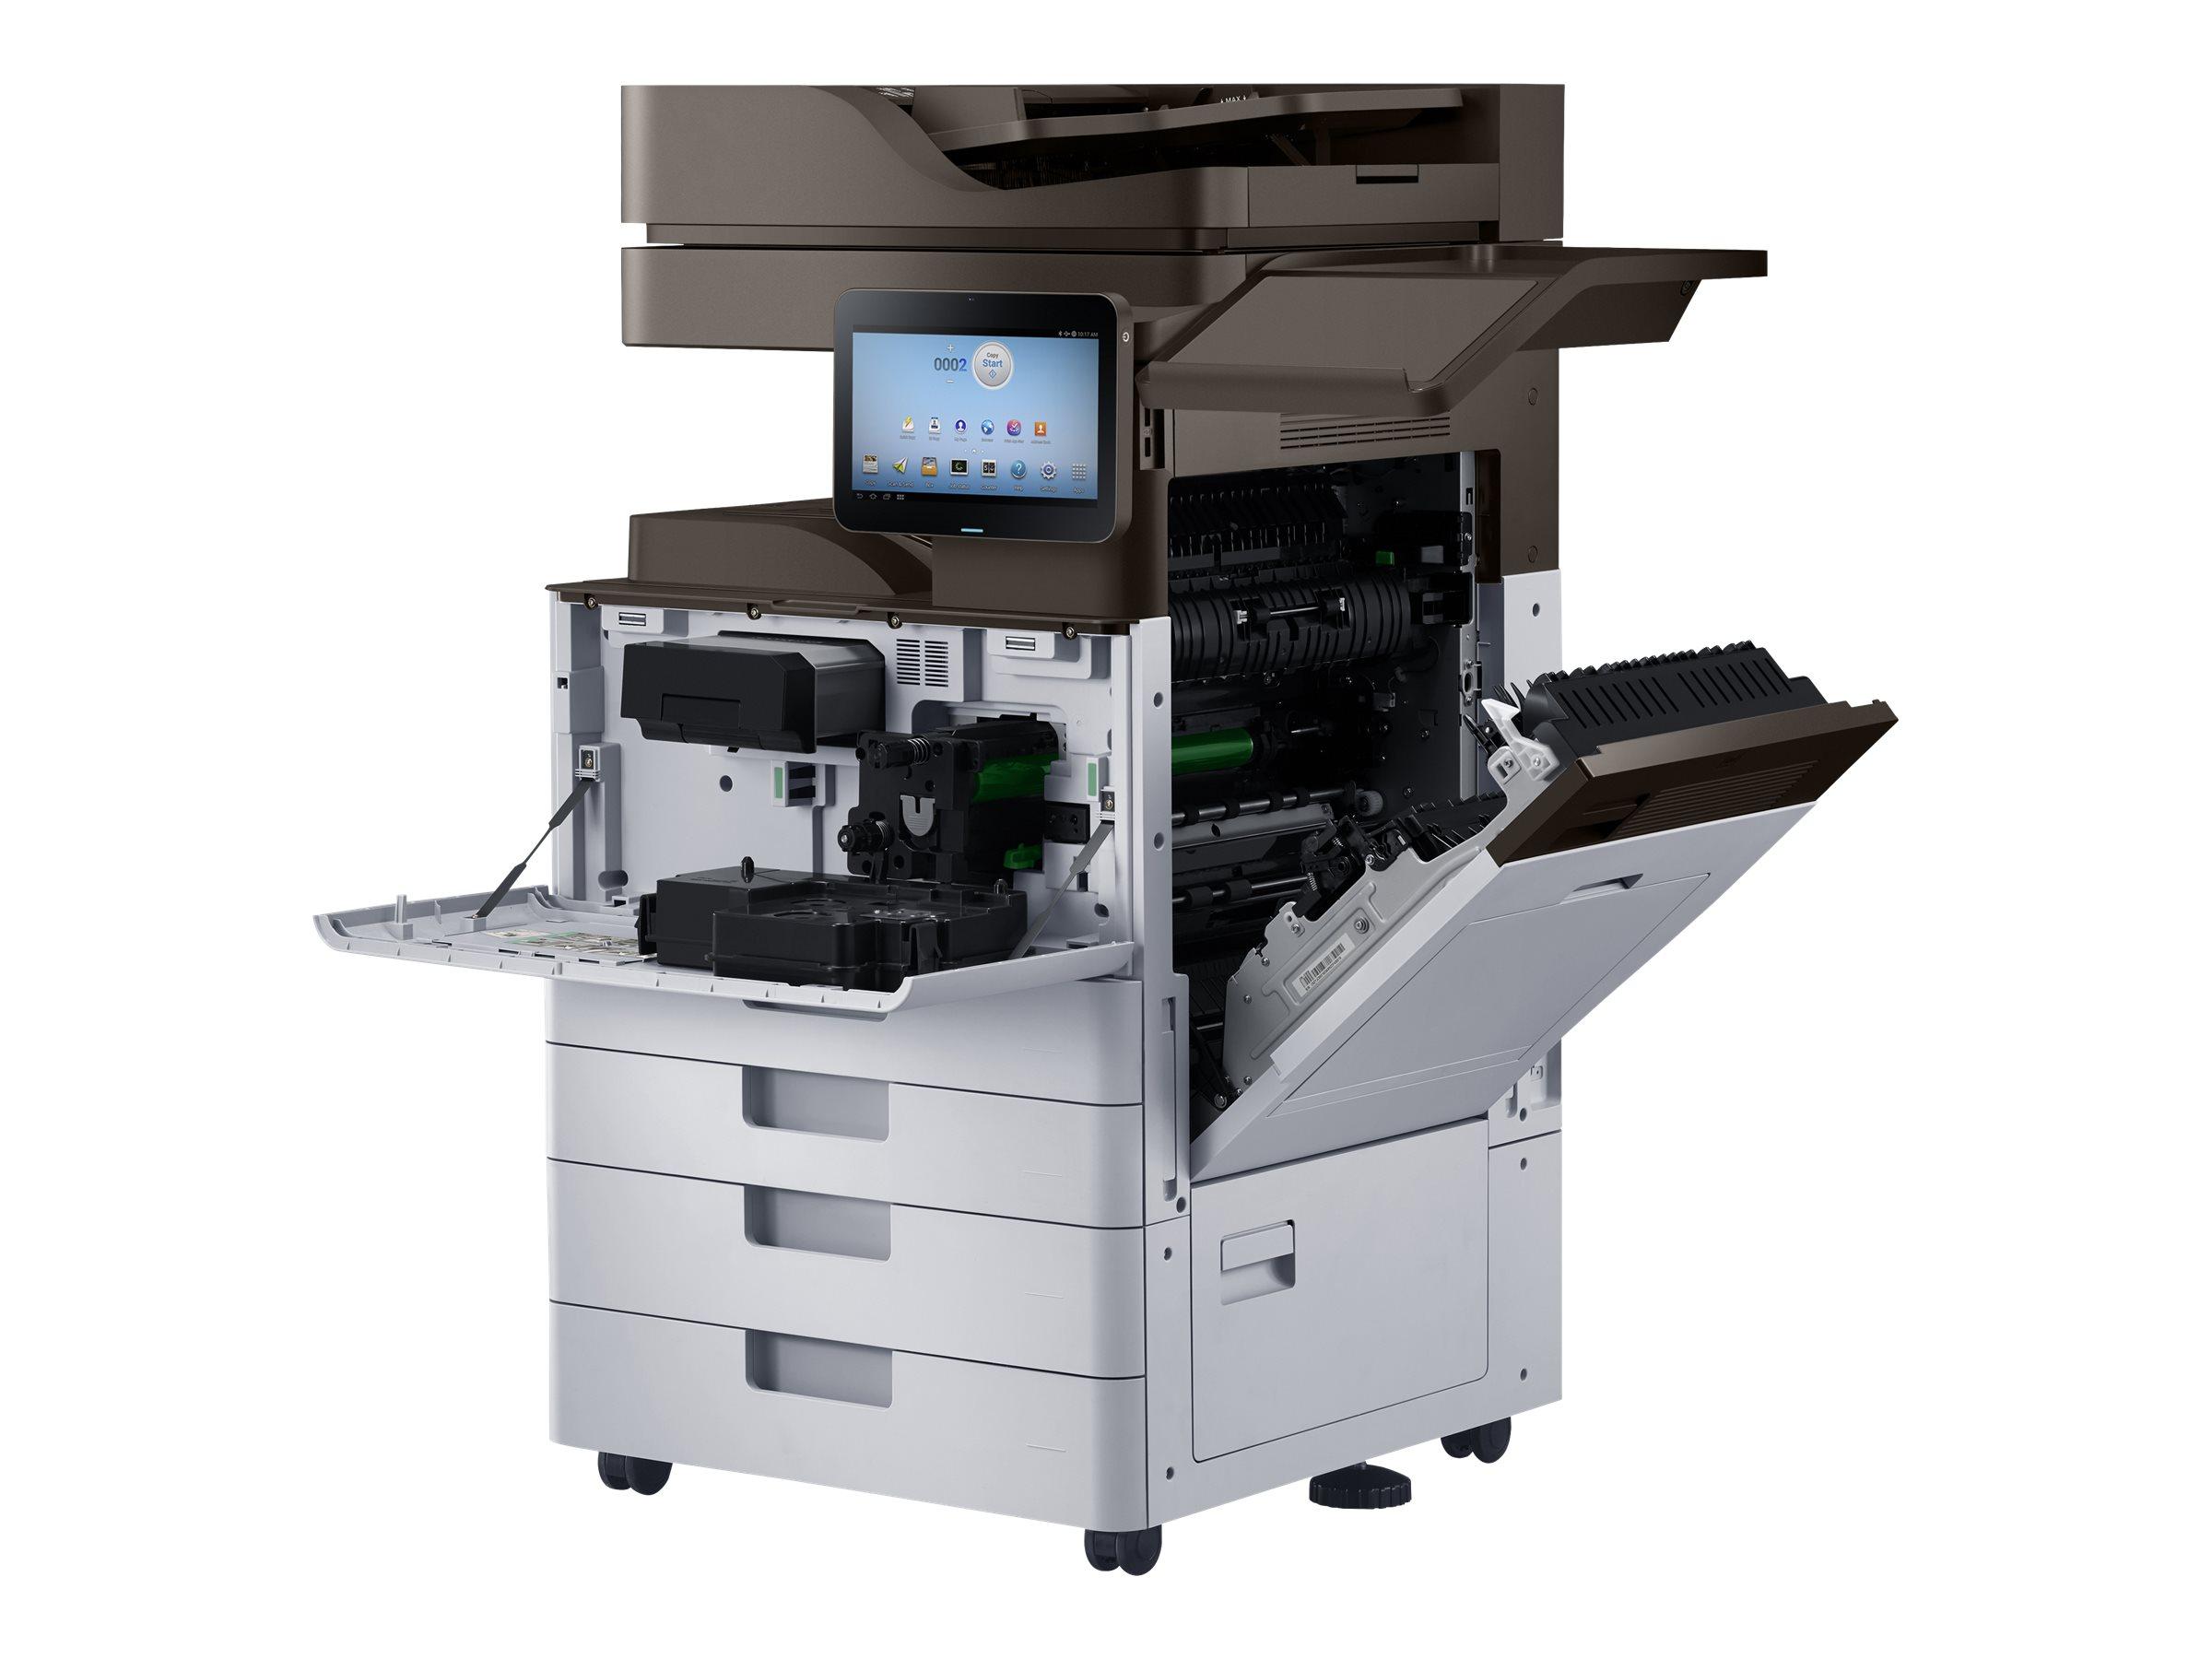 HP Samsung MultiXpress SL-K4300LX - Multifunktionsdrucker - s/w - Laser - A3 (297 x 420 mm)